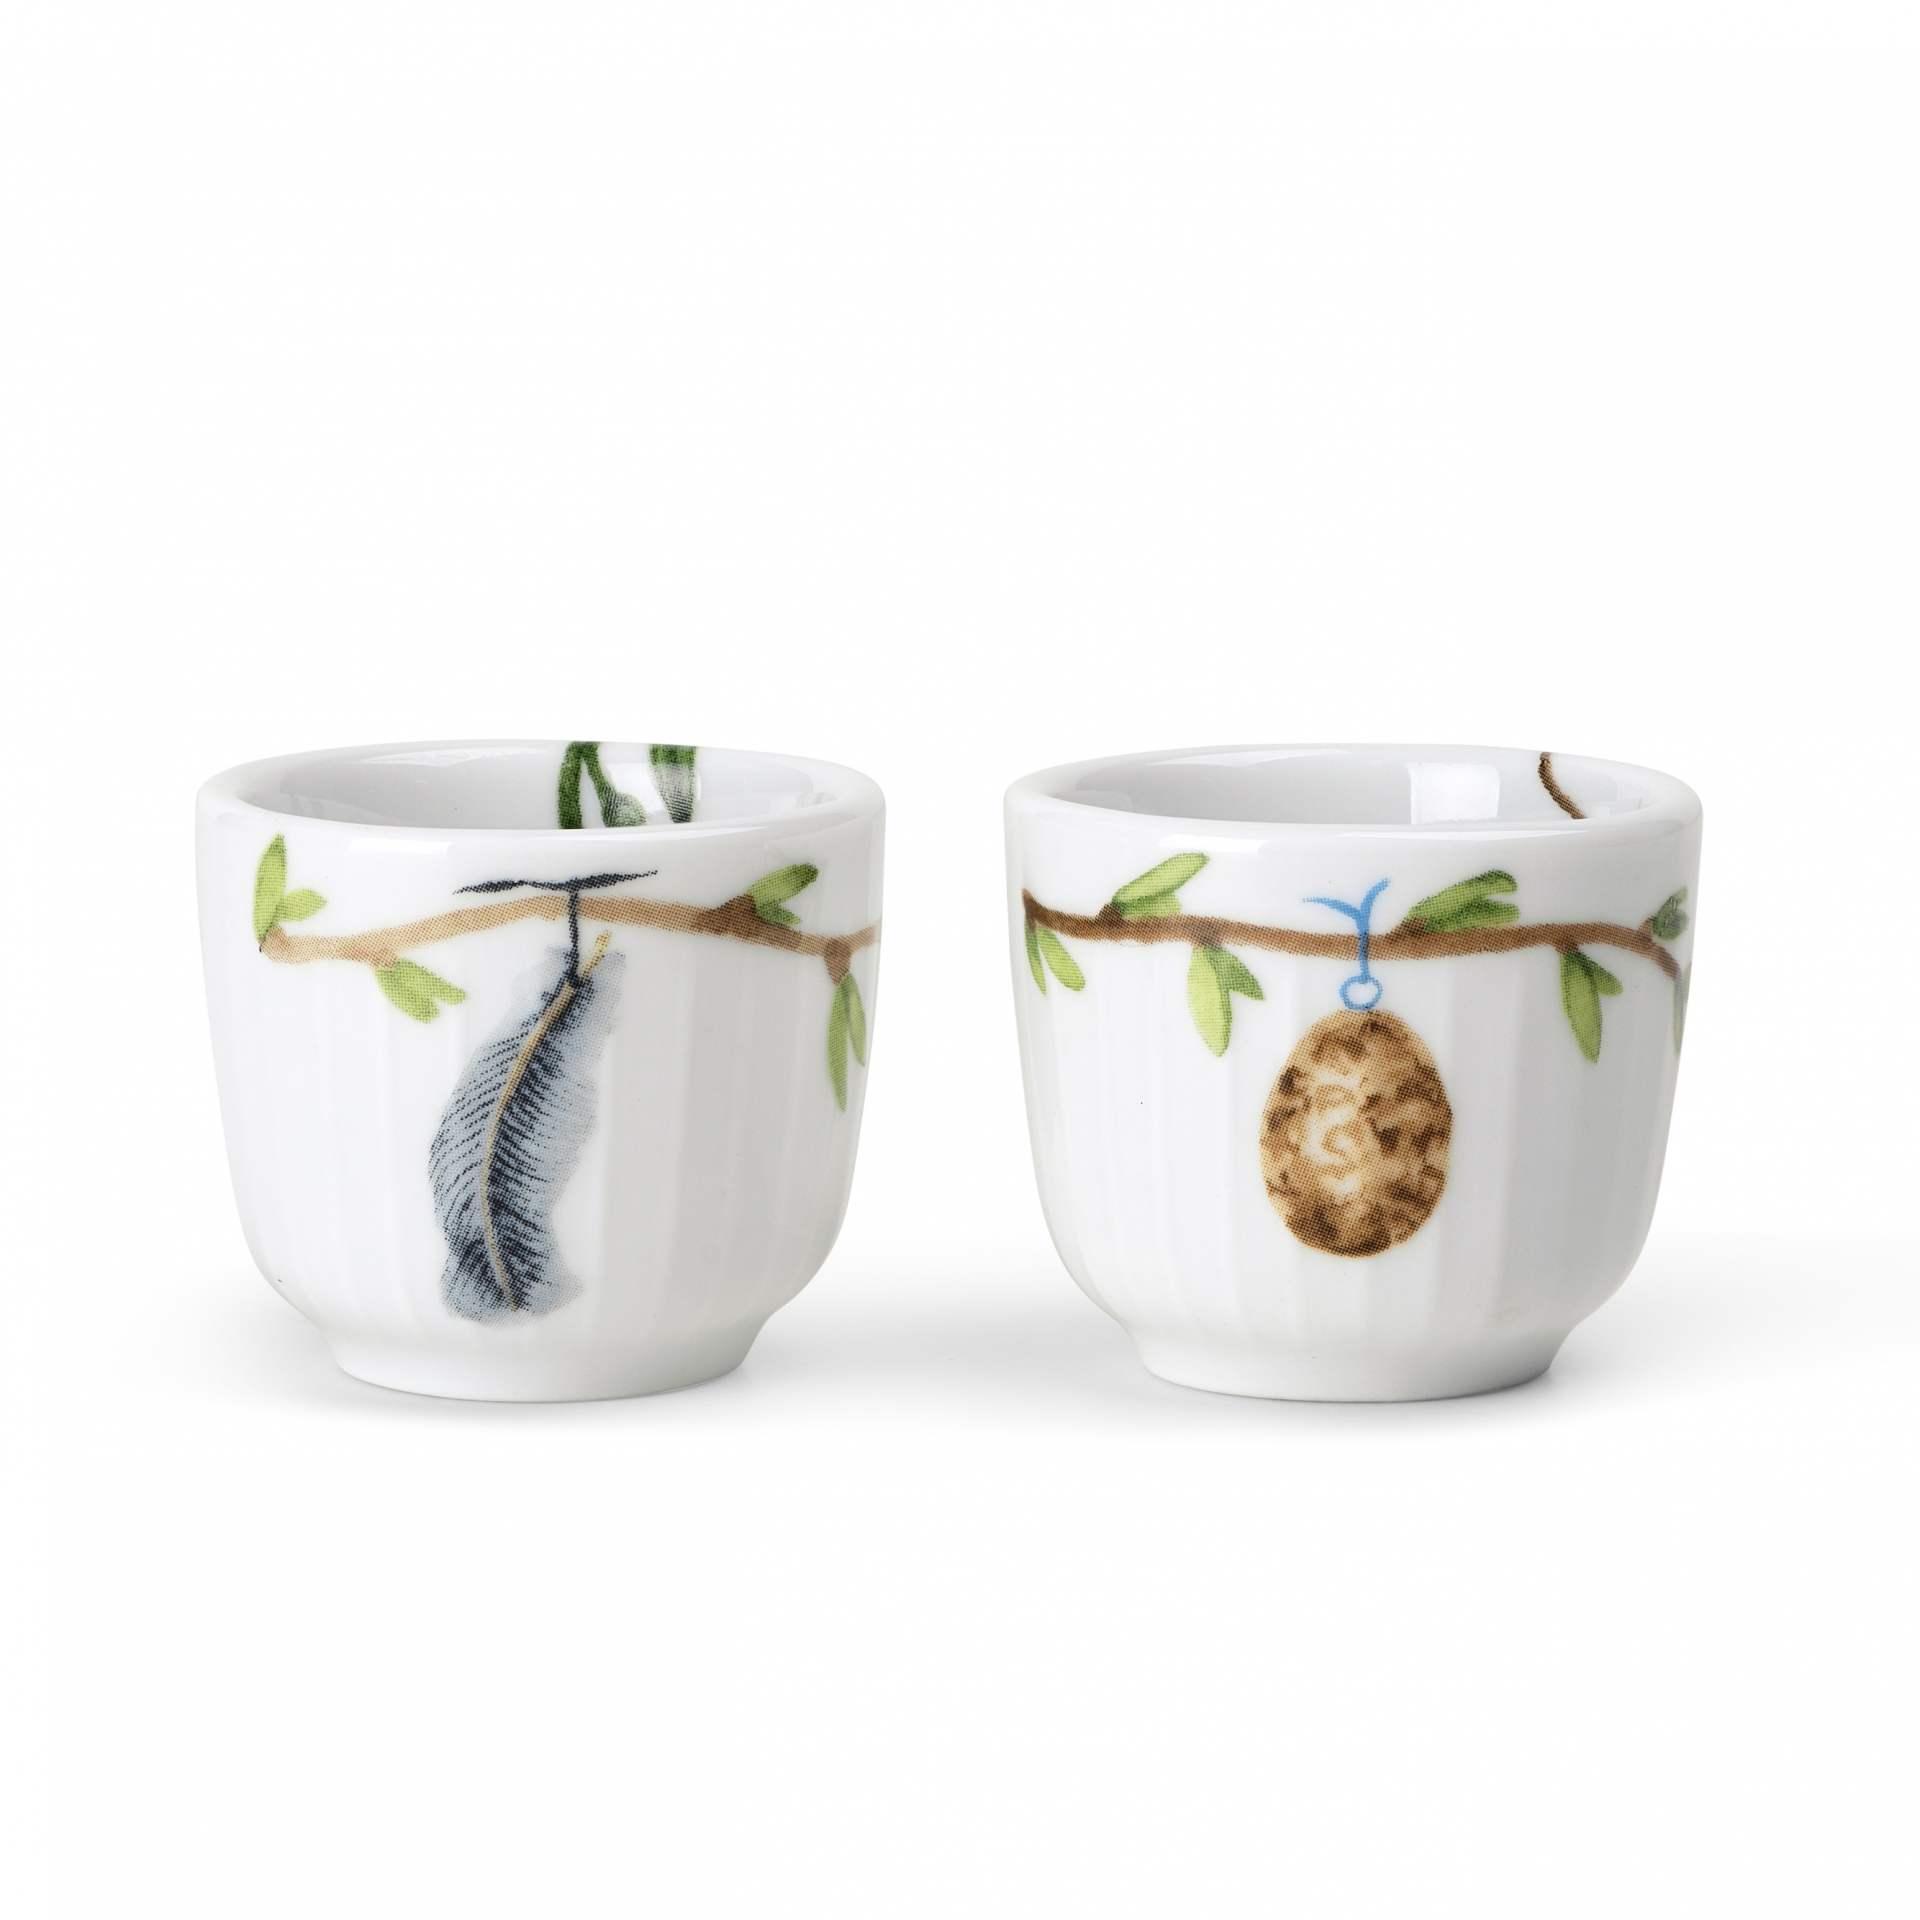 KÄHLER Stojánek na vajíčko Hammershøi Spring - set 2 ks, bílá barva, porcelán